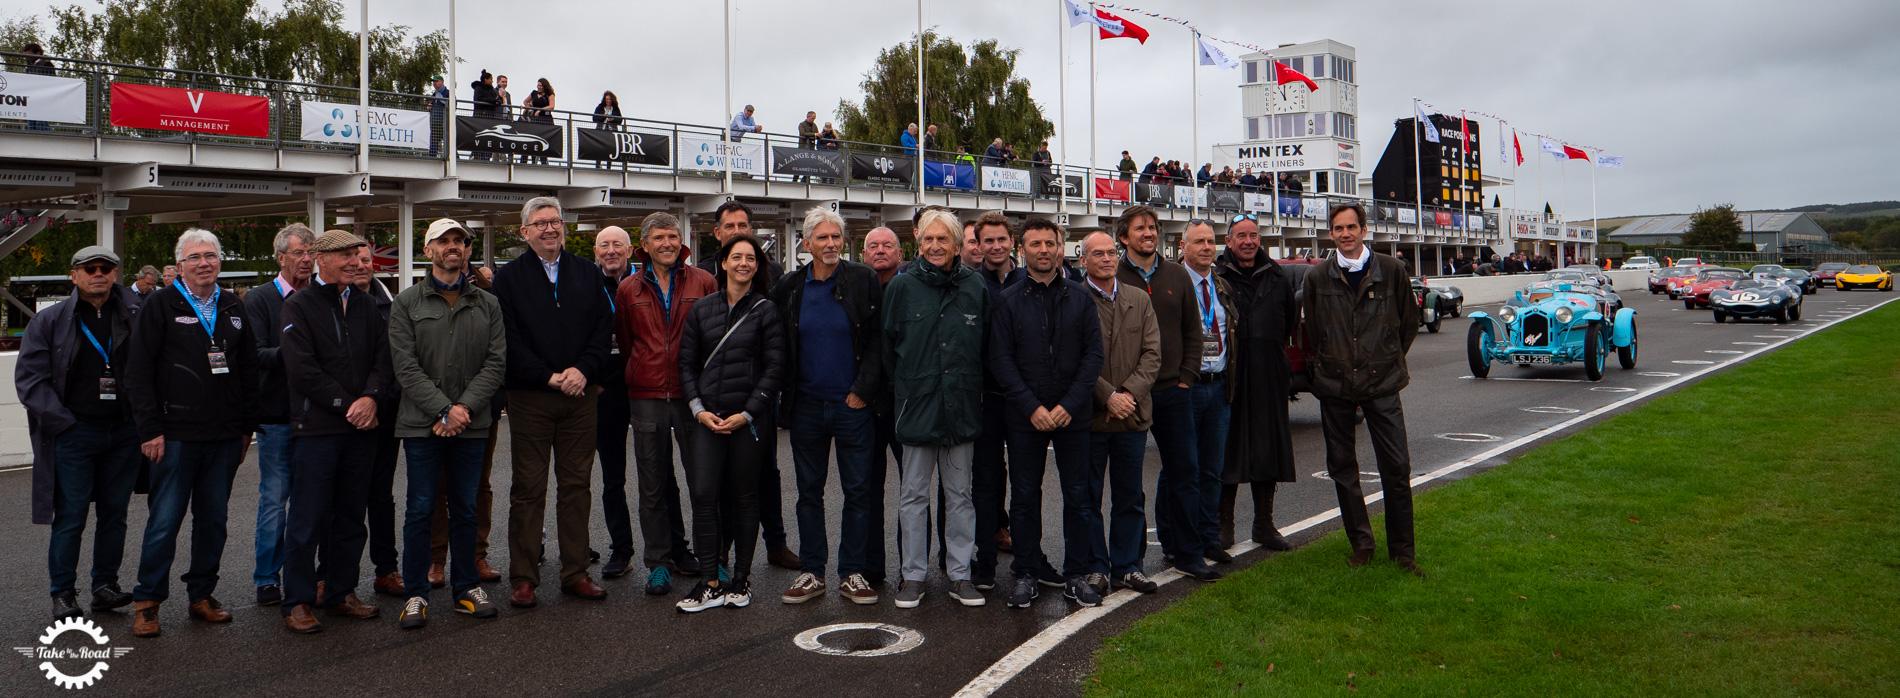 Hope for Tomorrow Goodwood Veloce Trackday raises £100k for Charity